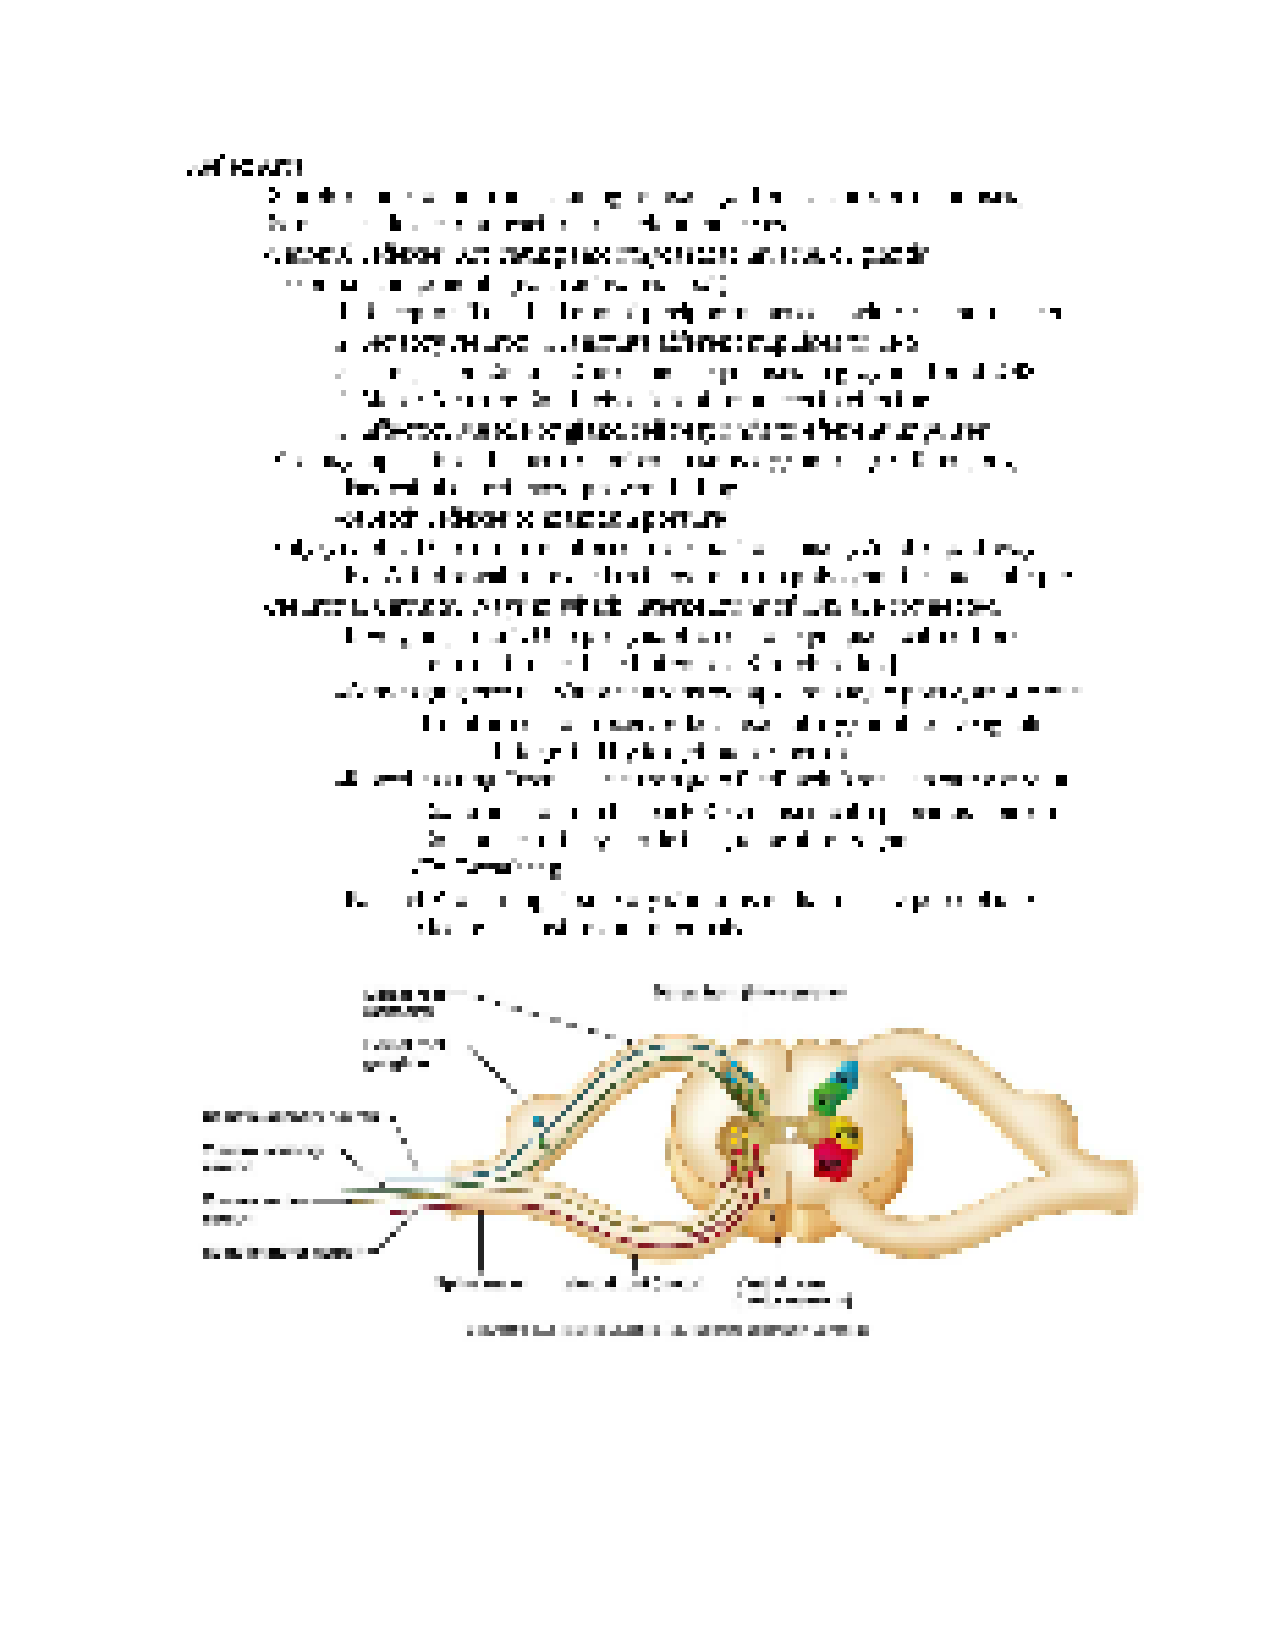 Anatomy study guide